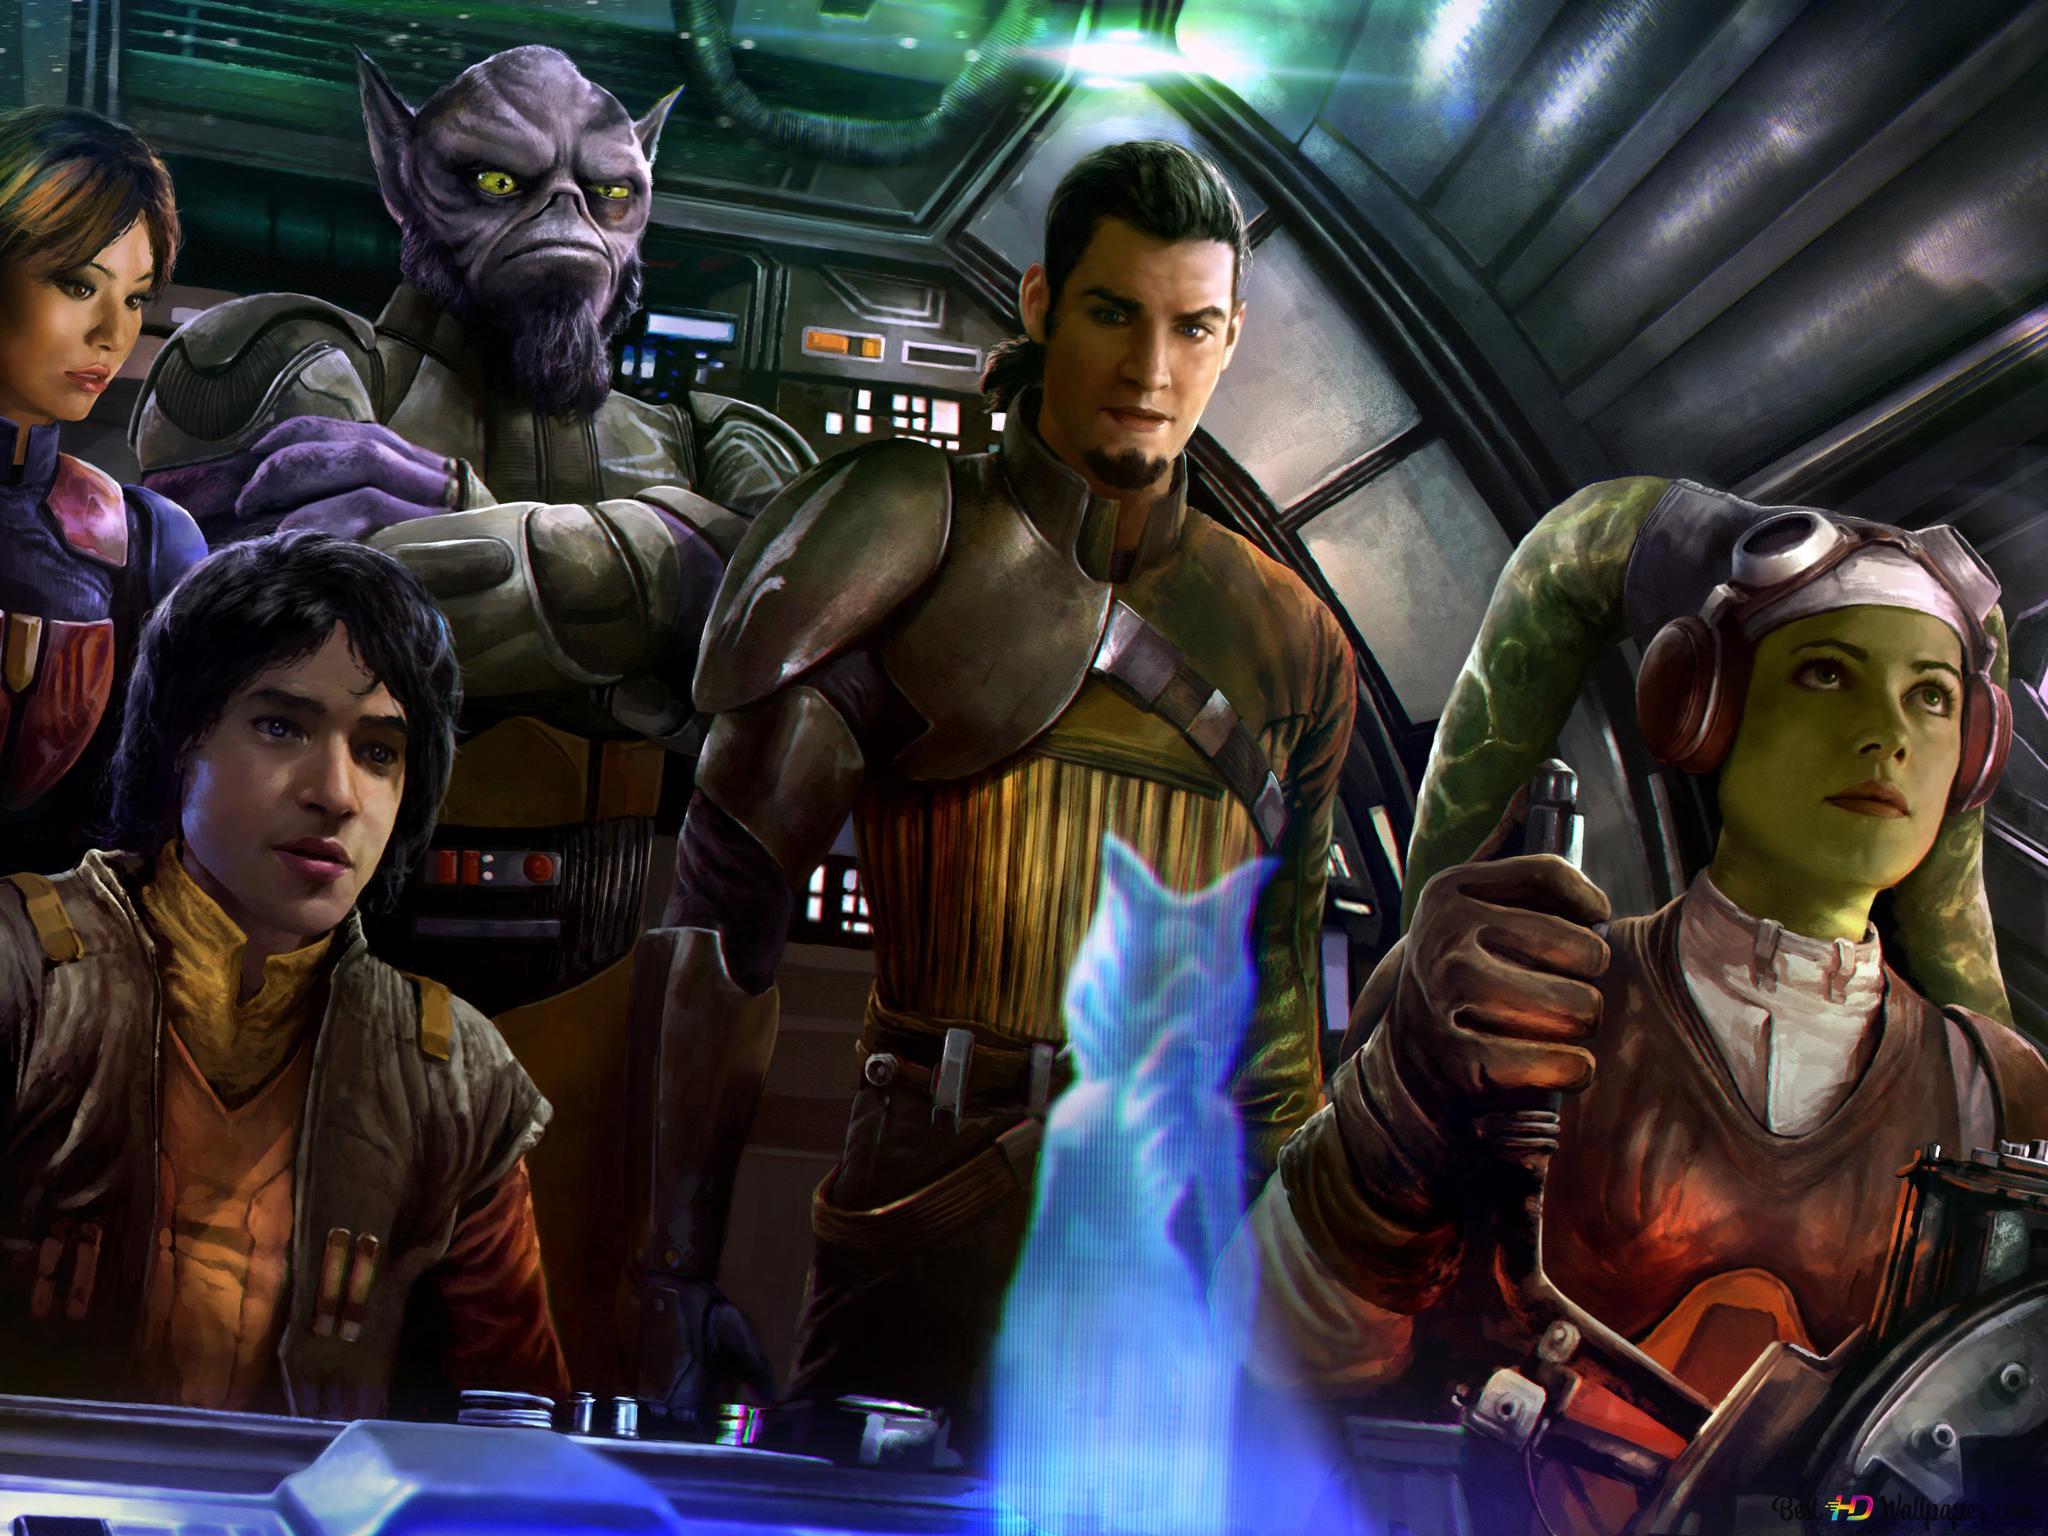 Star Wars Rebels Series Hd Wallpaper Download